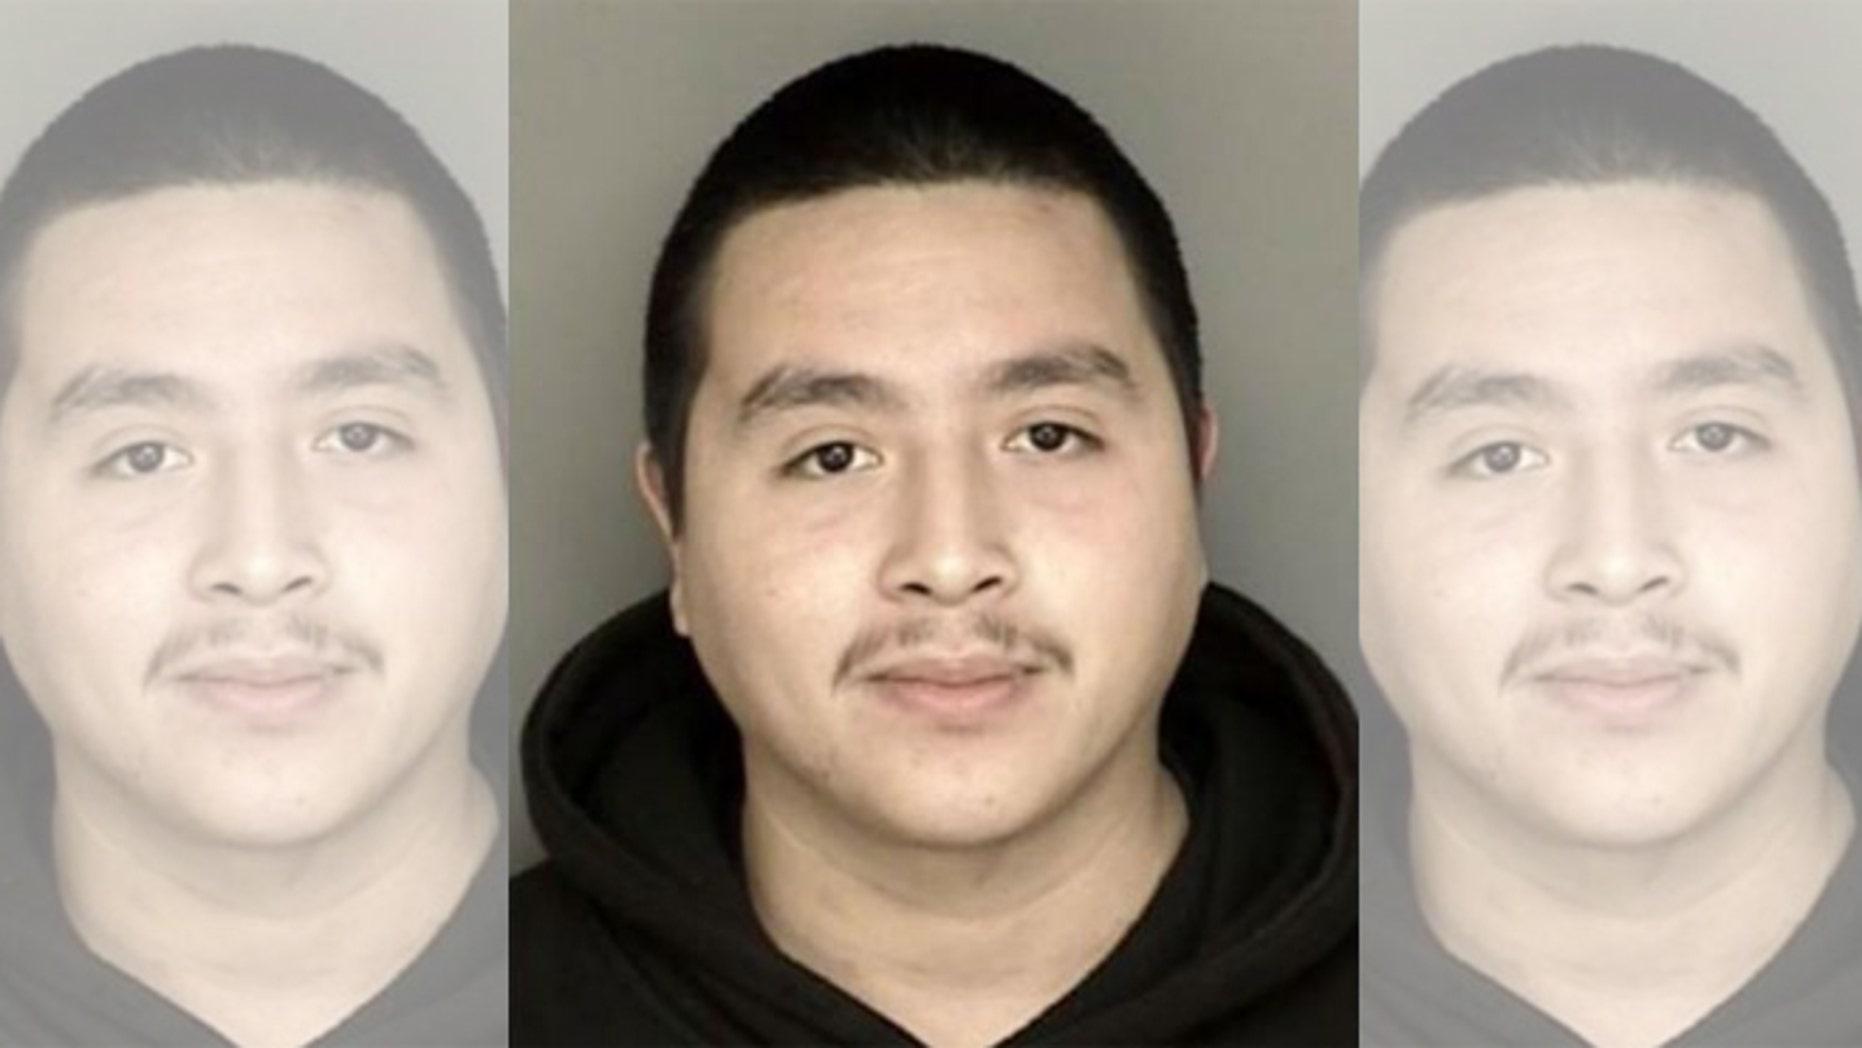 Alleged selfie-robber Victor Almanza-Martinez. (Photo: Pacific Grove Police Department)